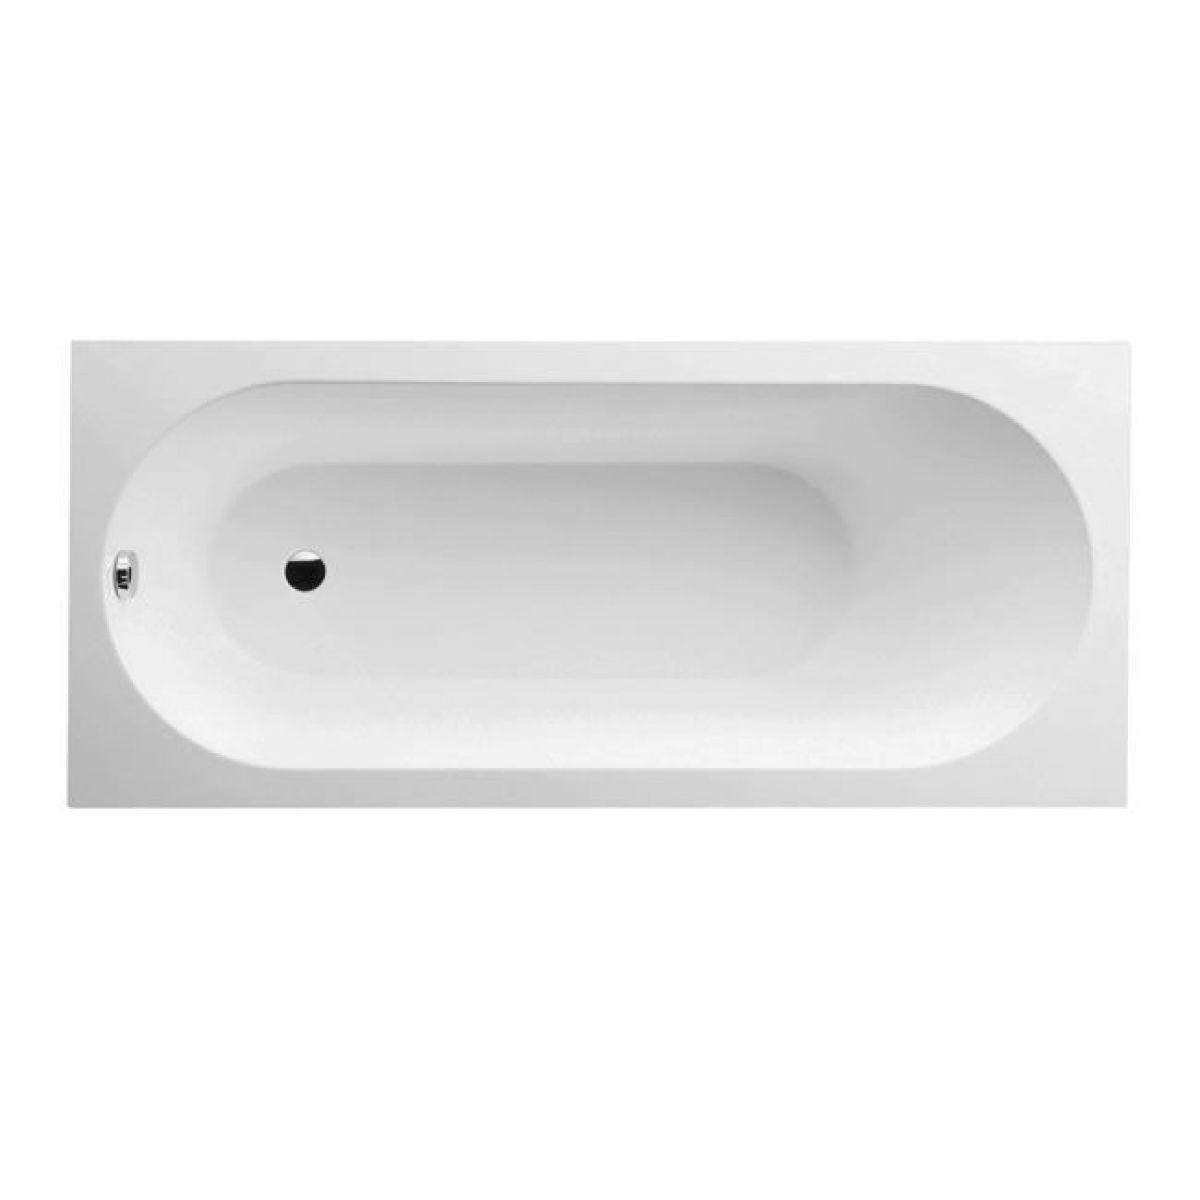 Shower Doors For Baths Villeroy Amp Boch Soho Oberon Quaryl Bath Uk Bathrooms